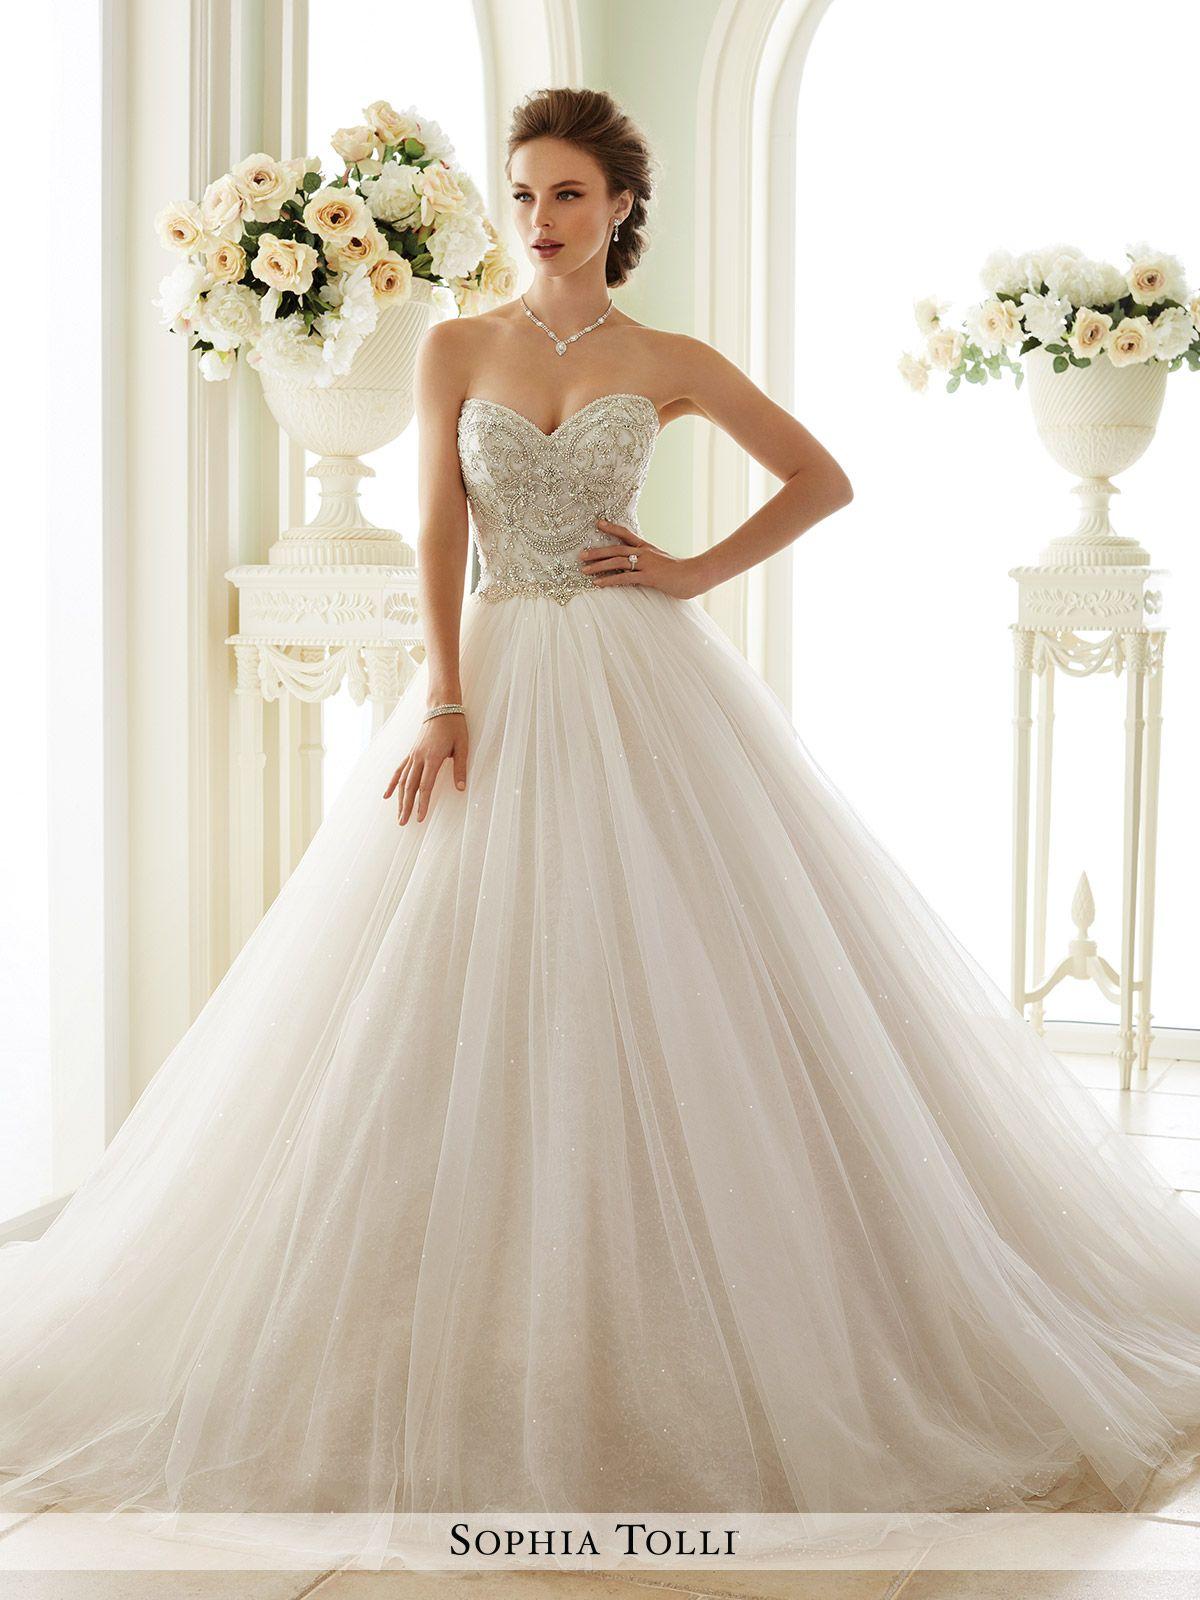 Strapless Sweetheart Neckline Tulle Wedding Gown - Sophia Tolli ... da97a8576363